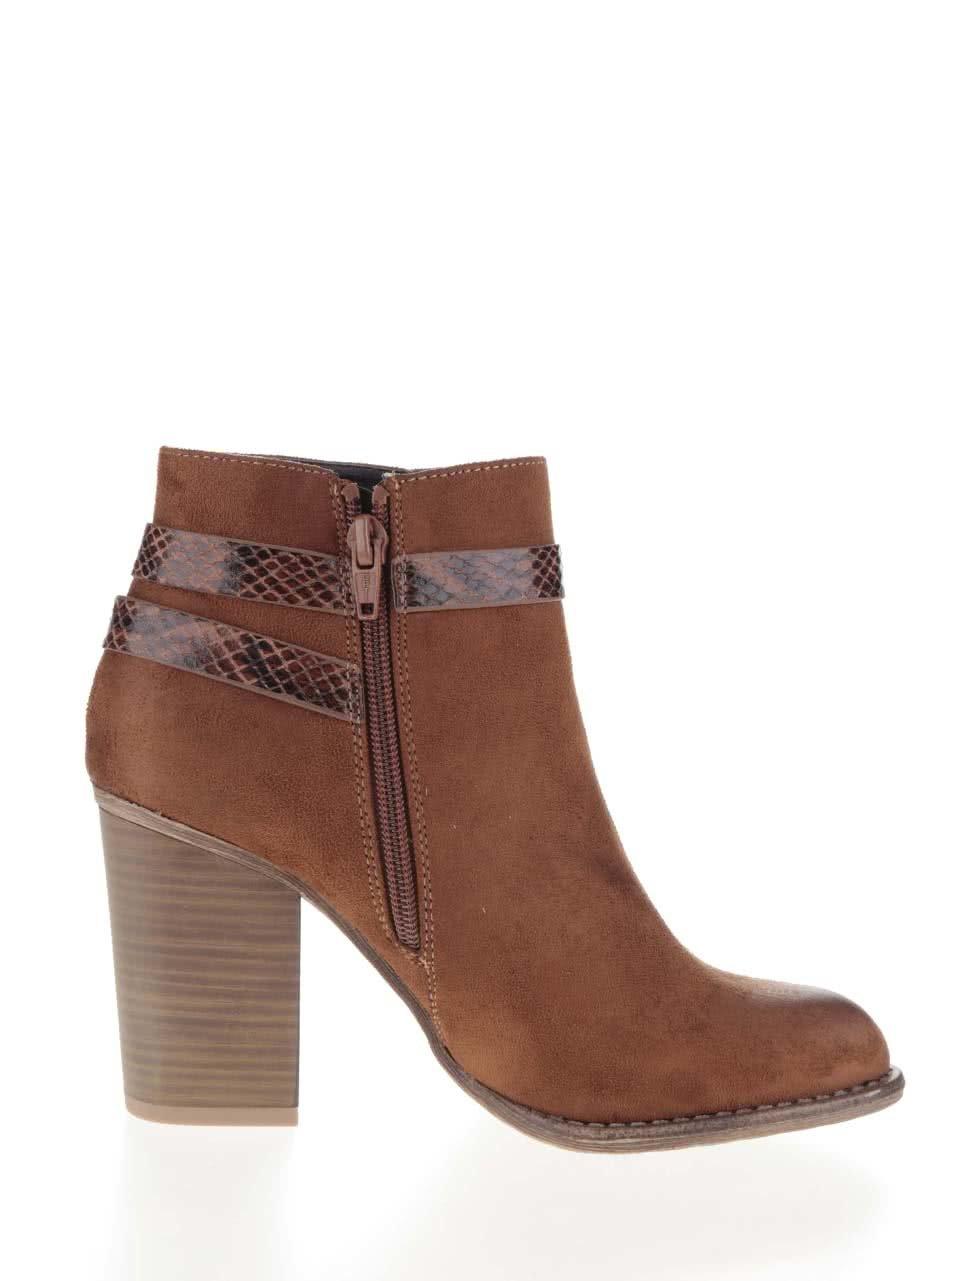 bca63750c2 Hnedé členkové topánky v semišovej úprave na podpätku Dorothy Perkins ...